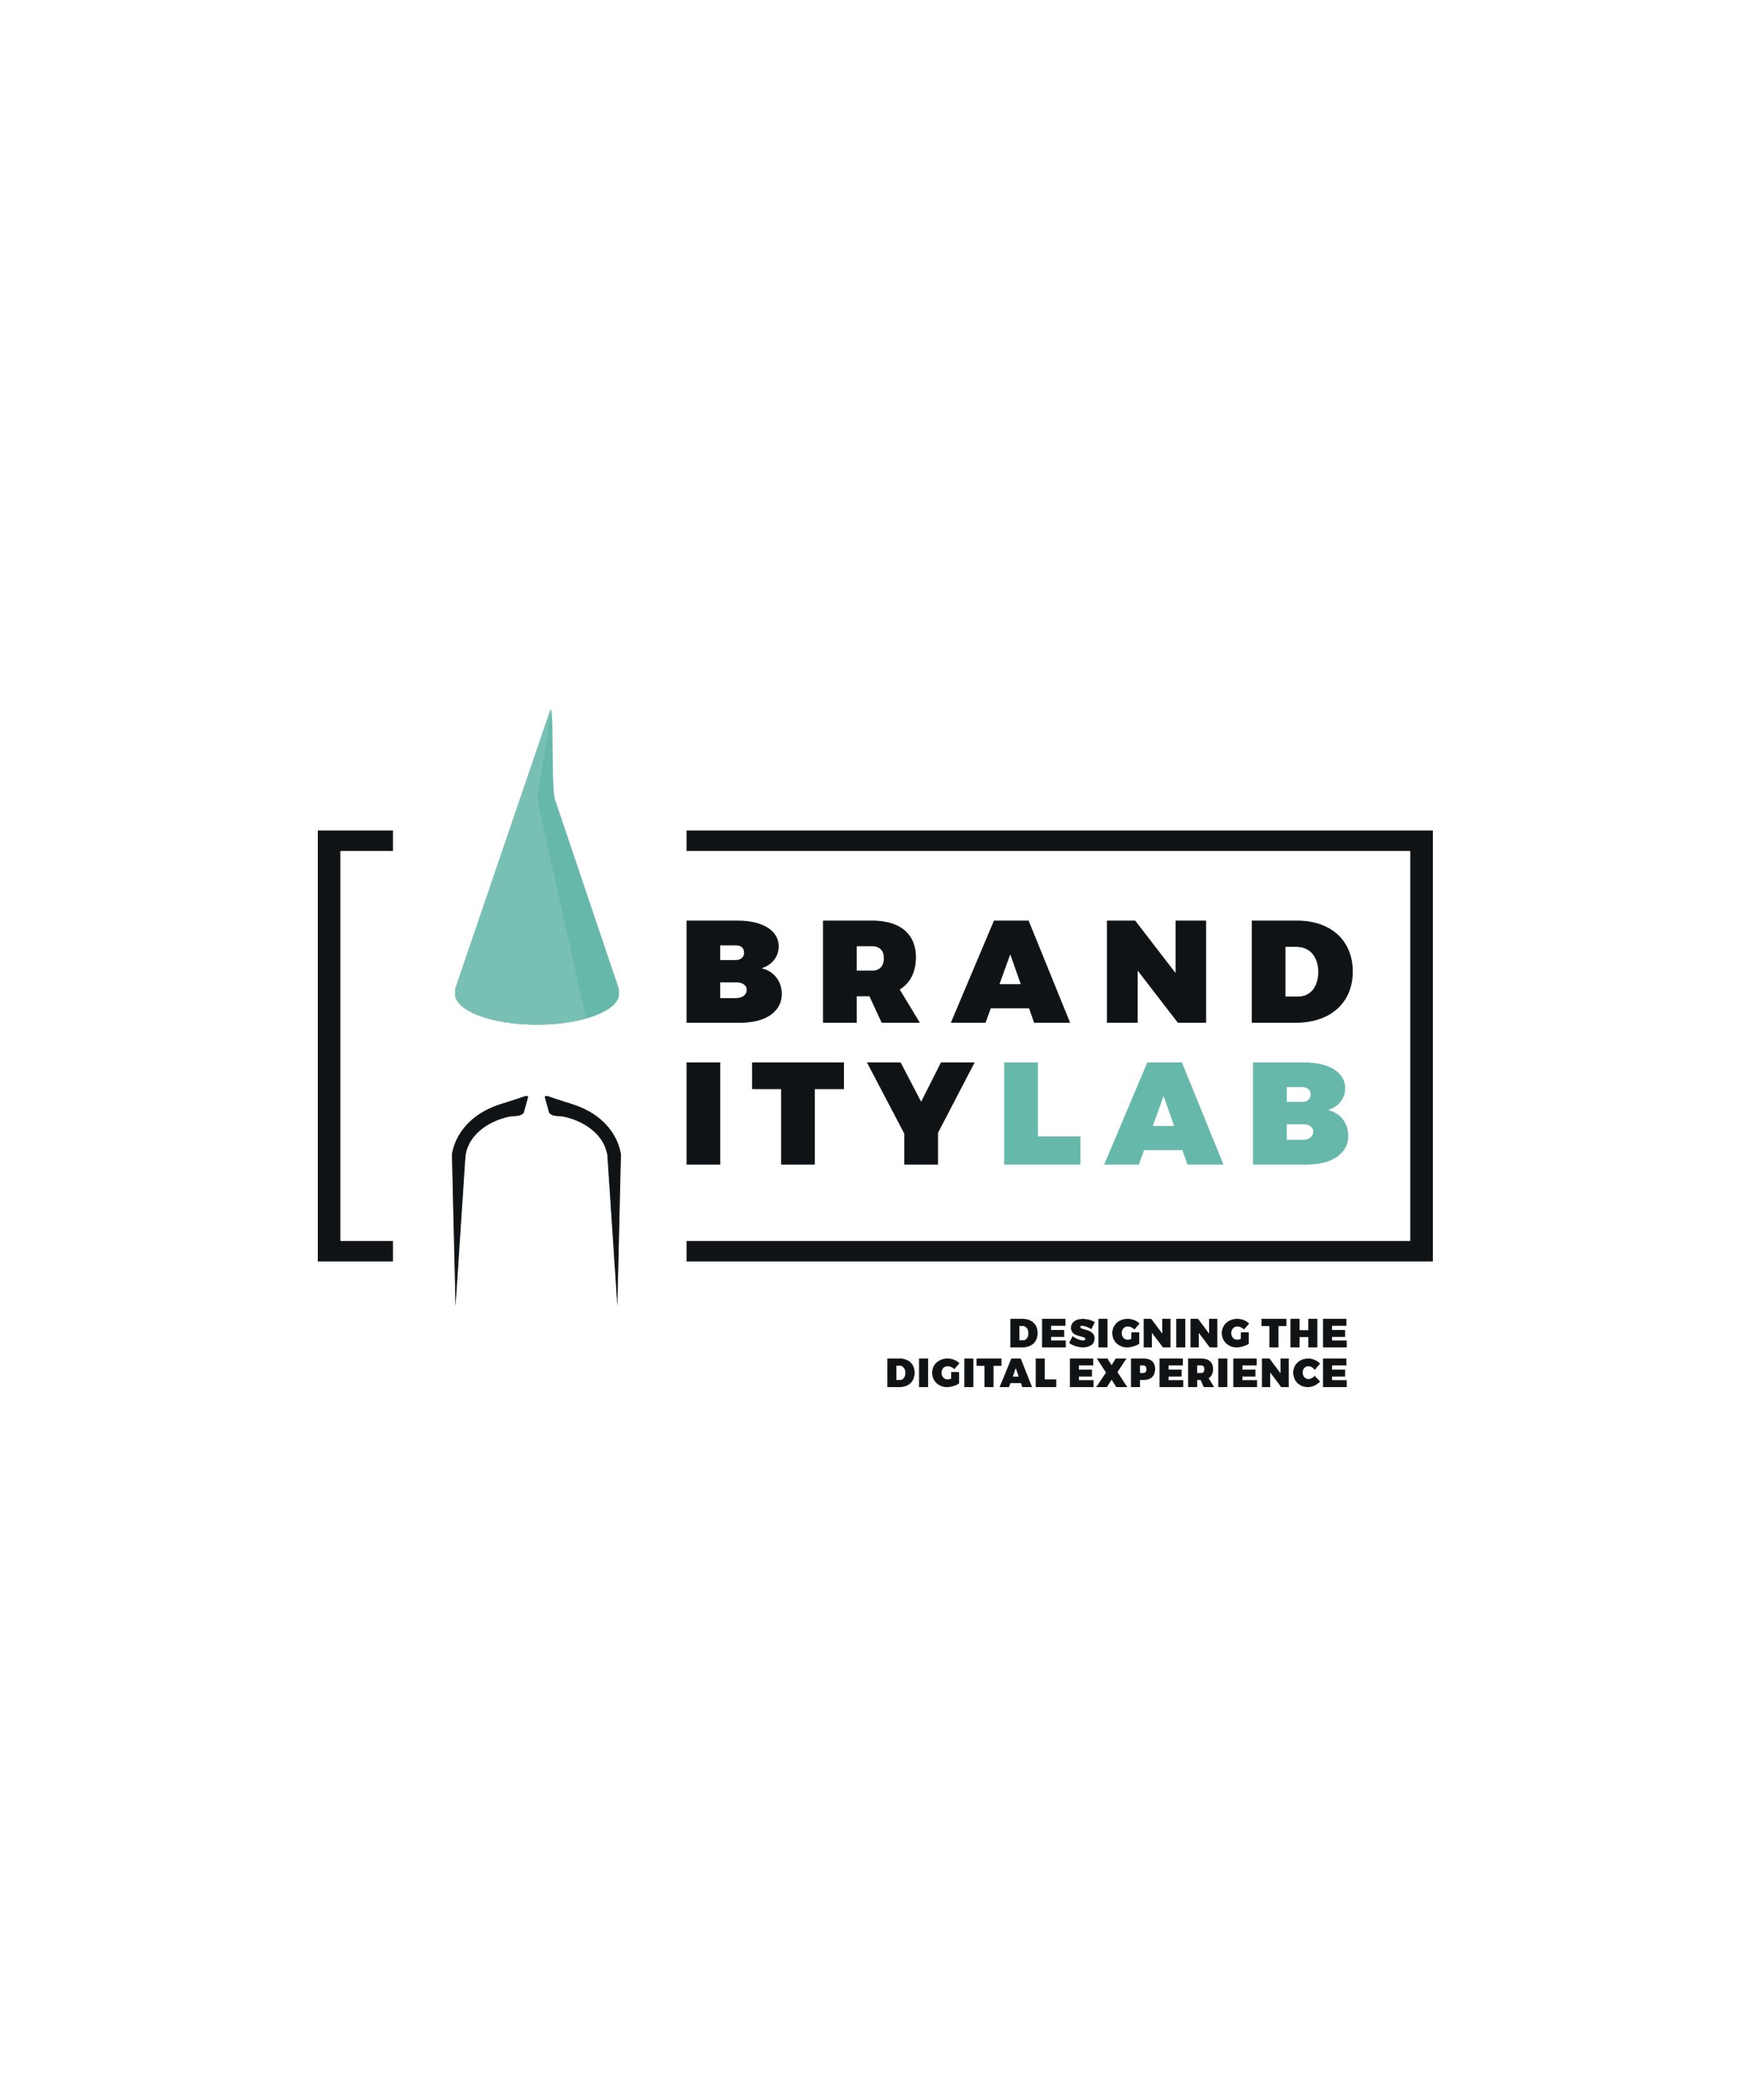 Branditylab